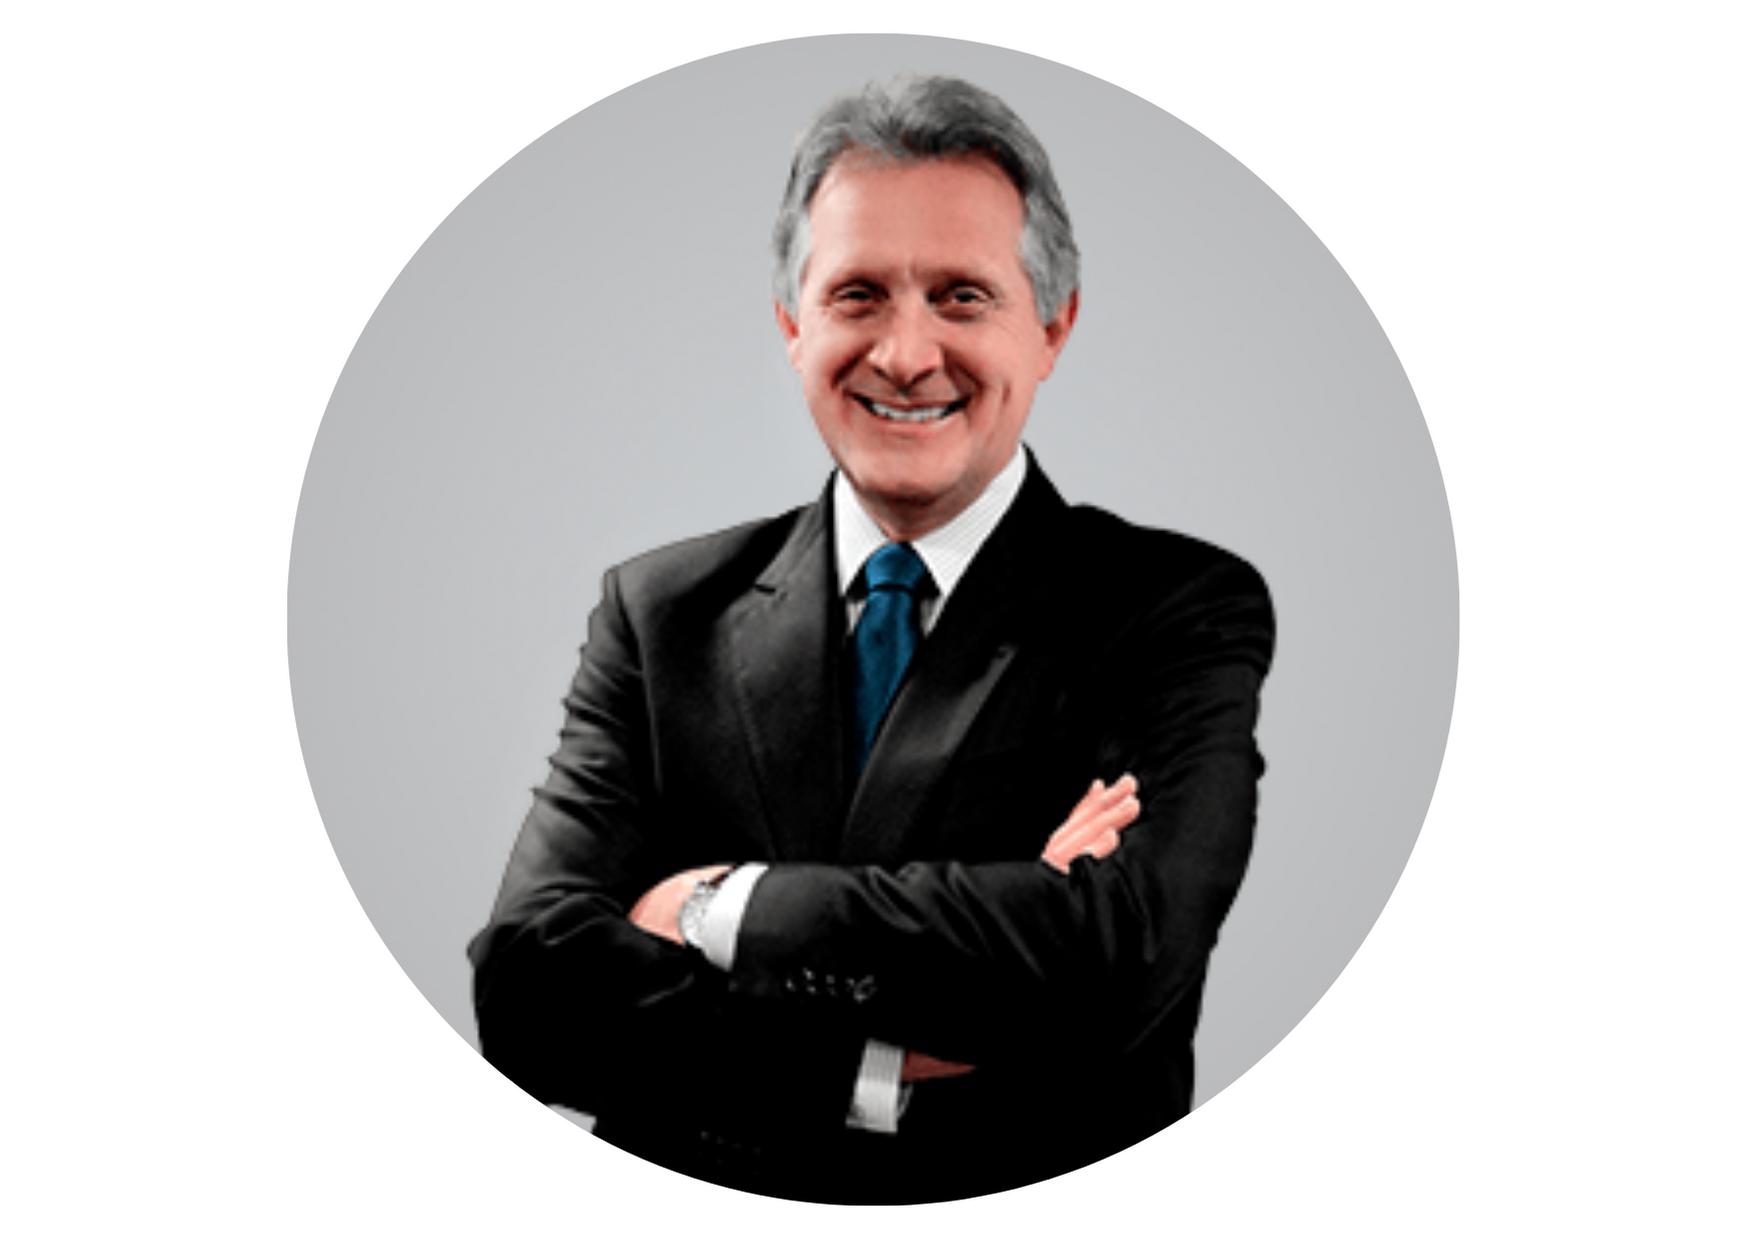 Reinaldo Passadori